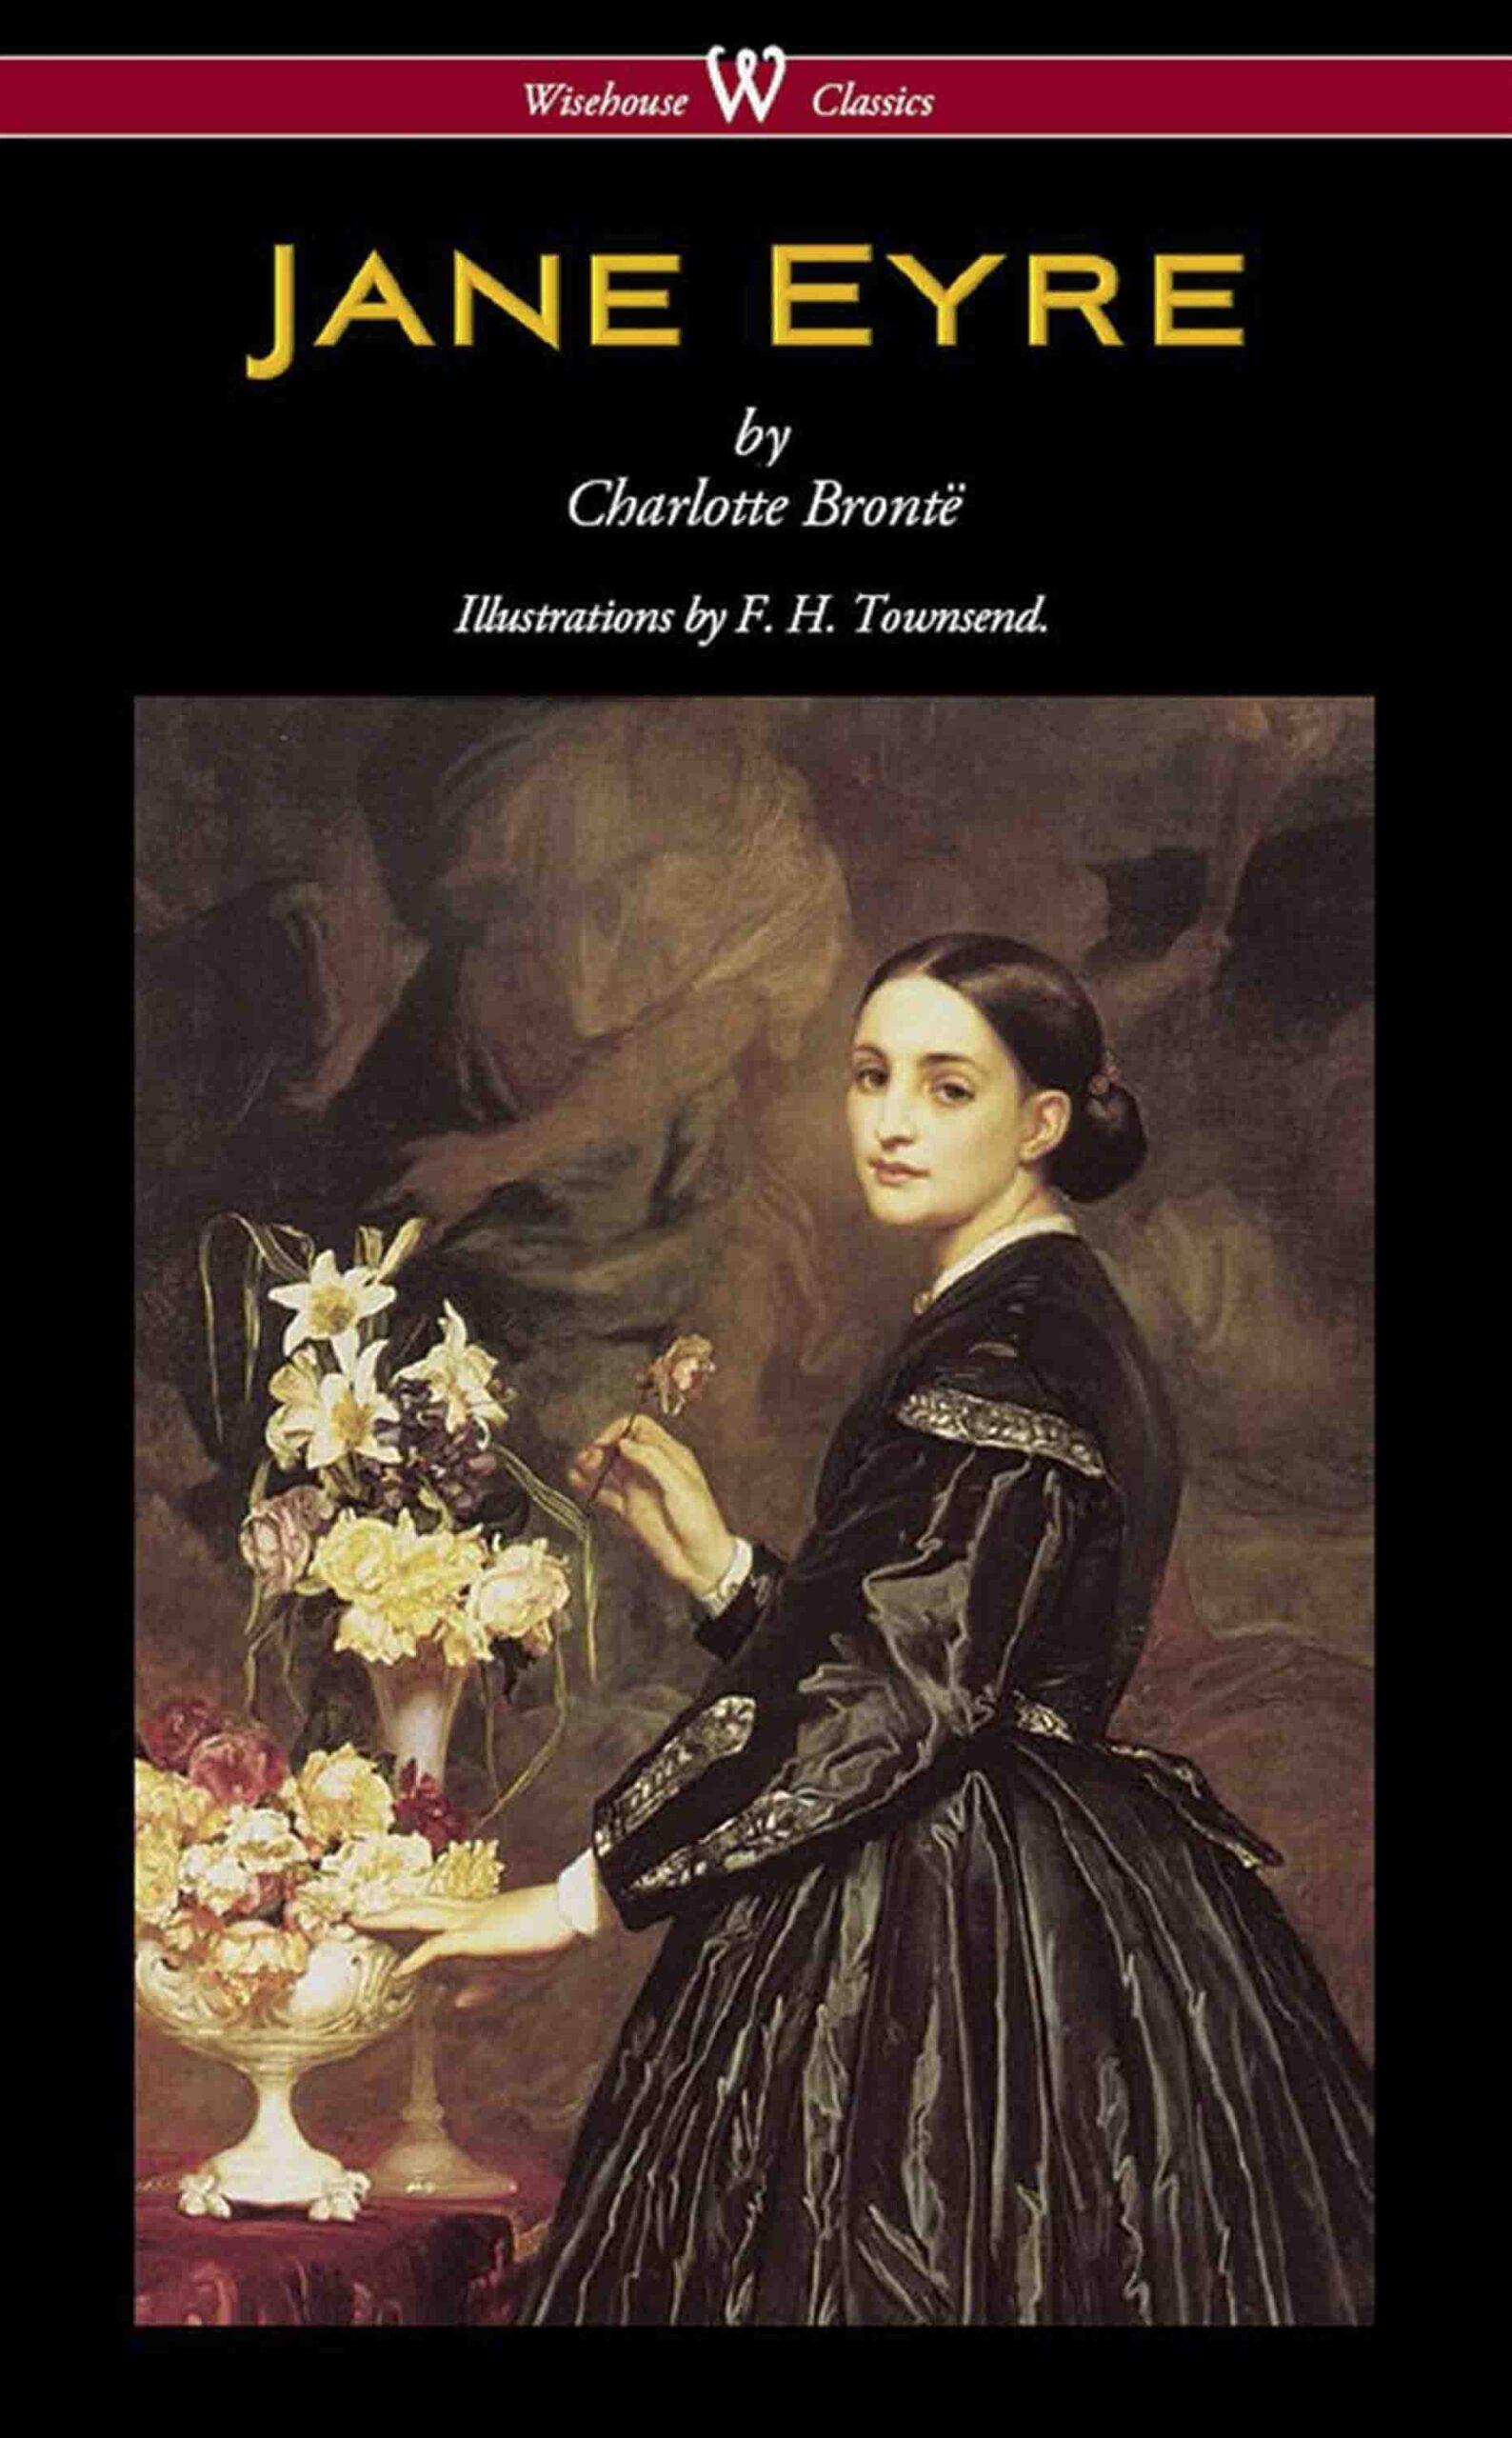 Jane Eyre (Wisehouse Classics Edition)